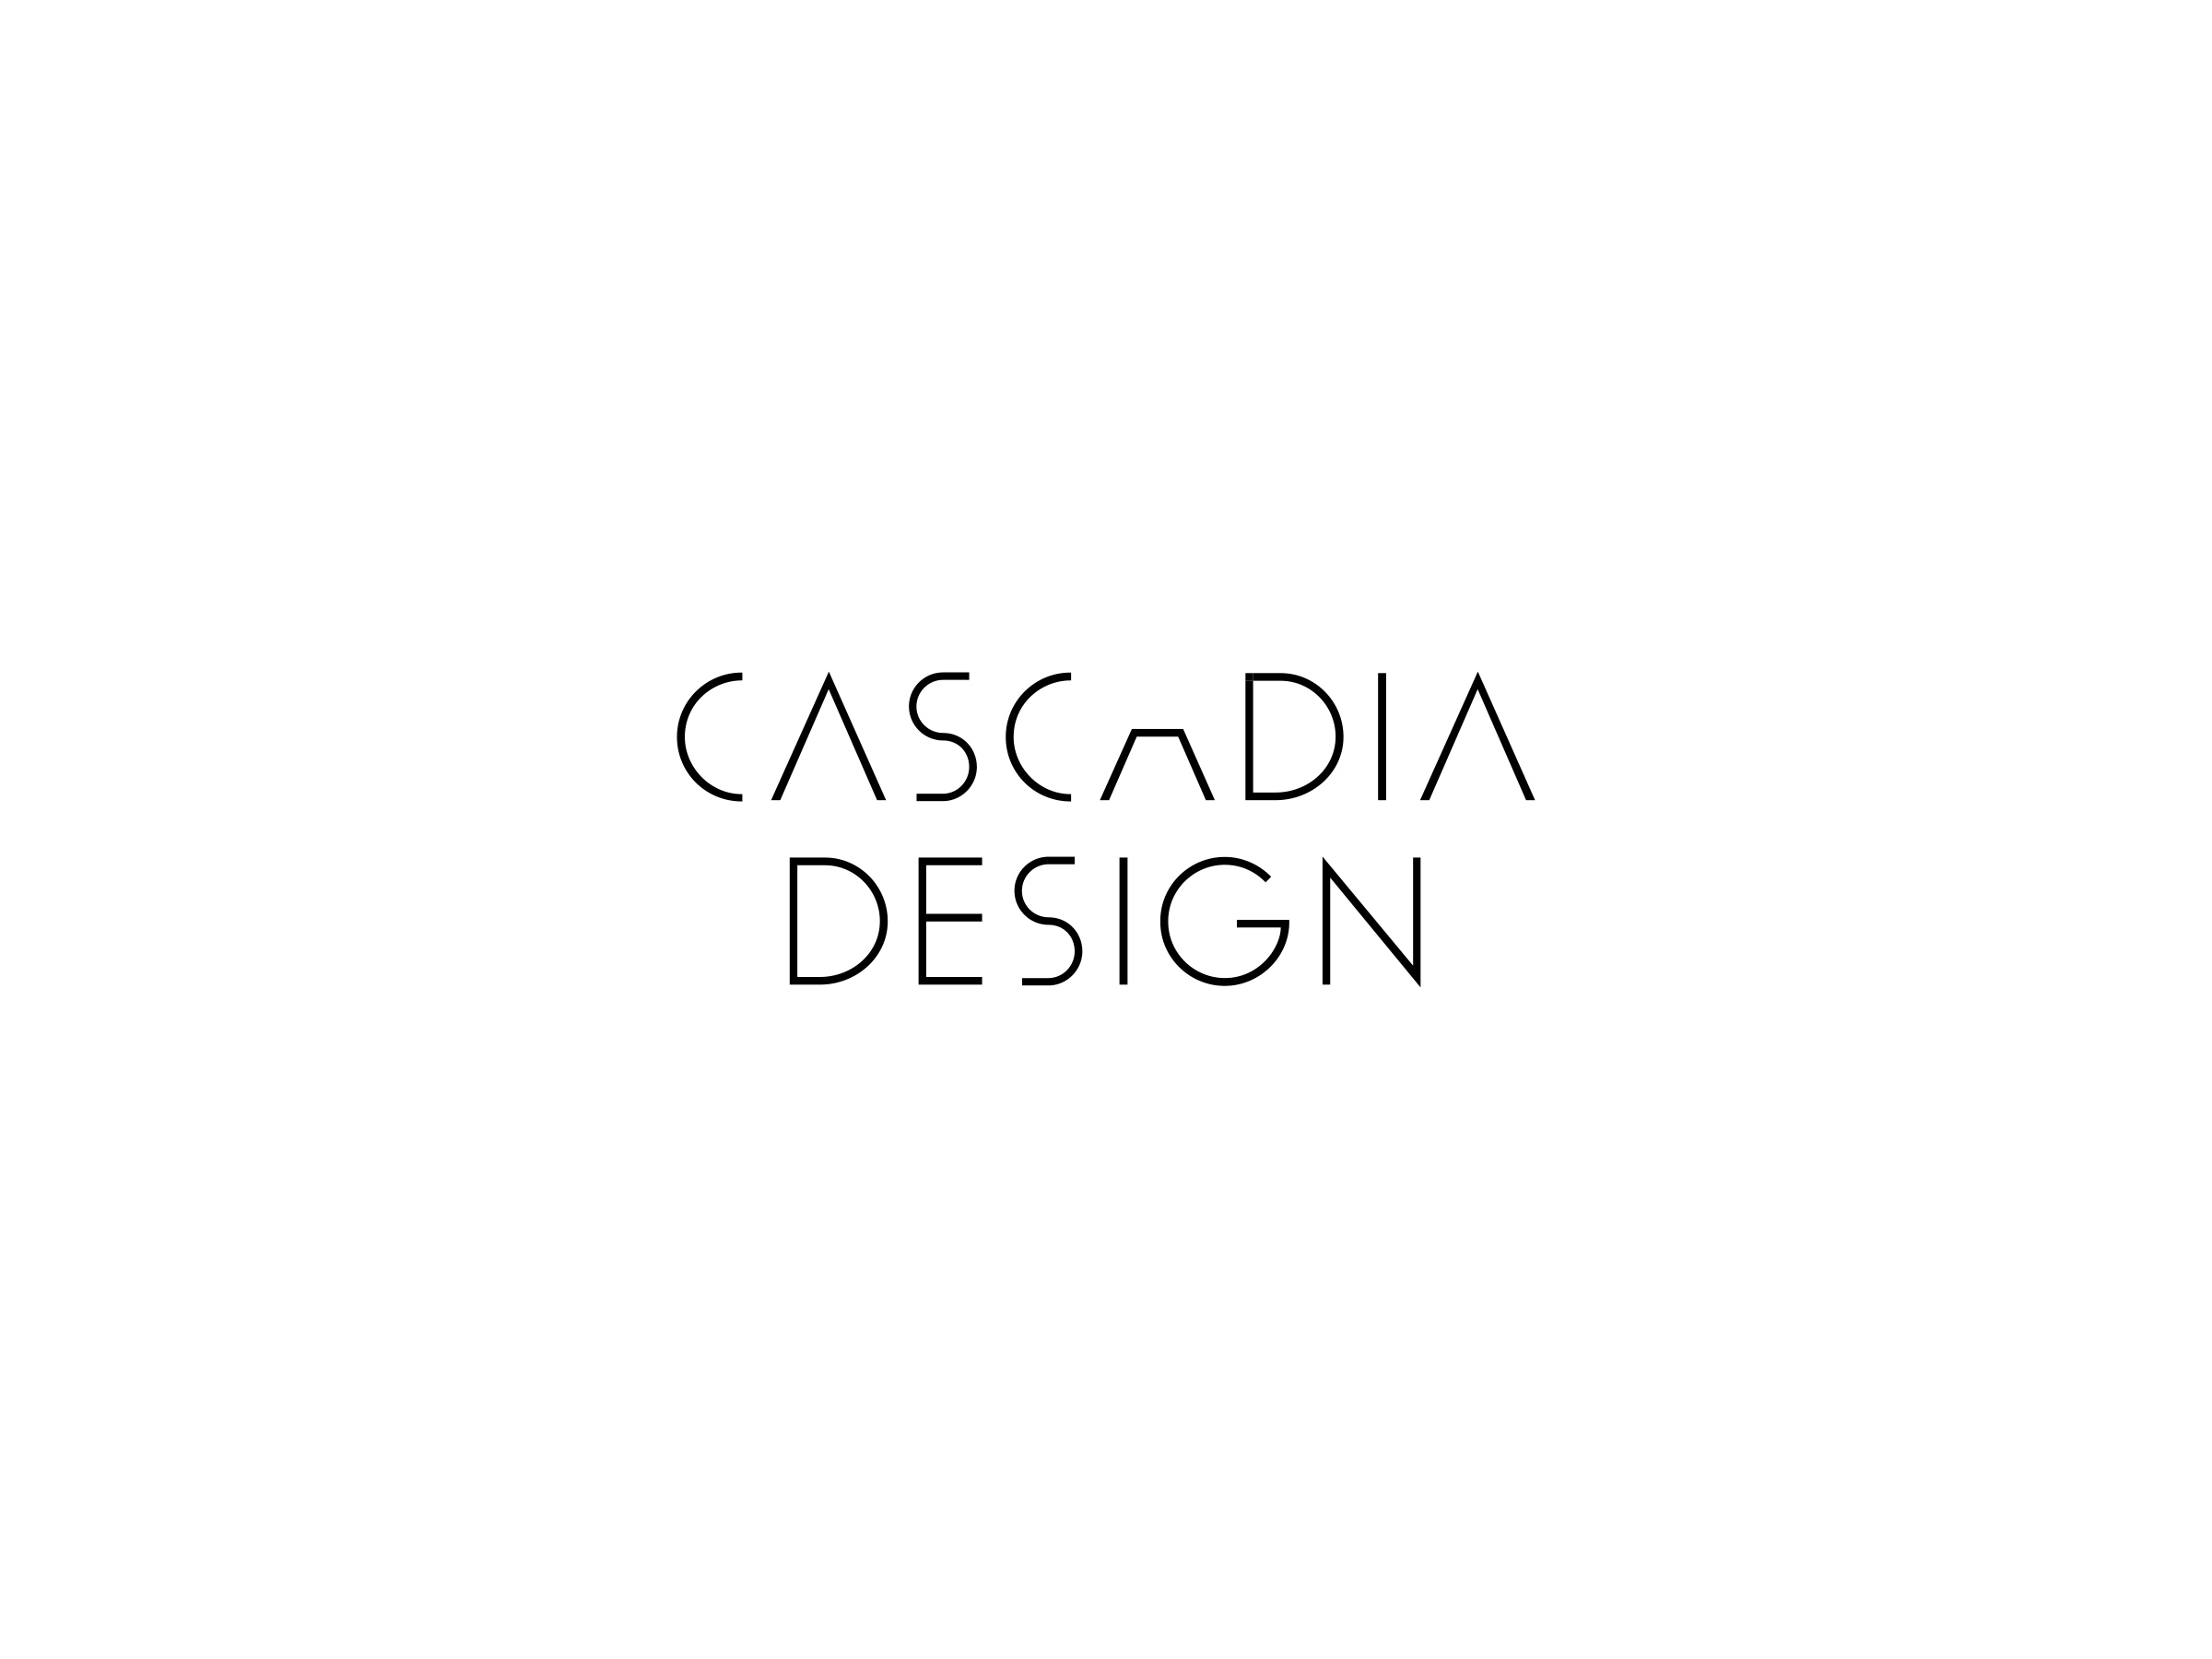 CascadiaDesign_logo_final.jpg